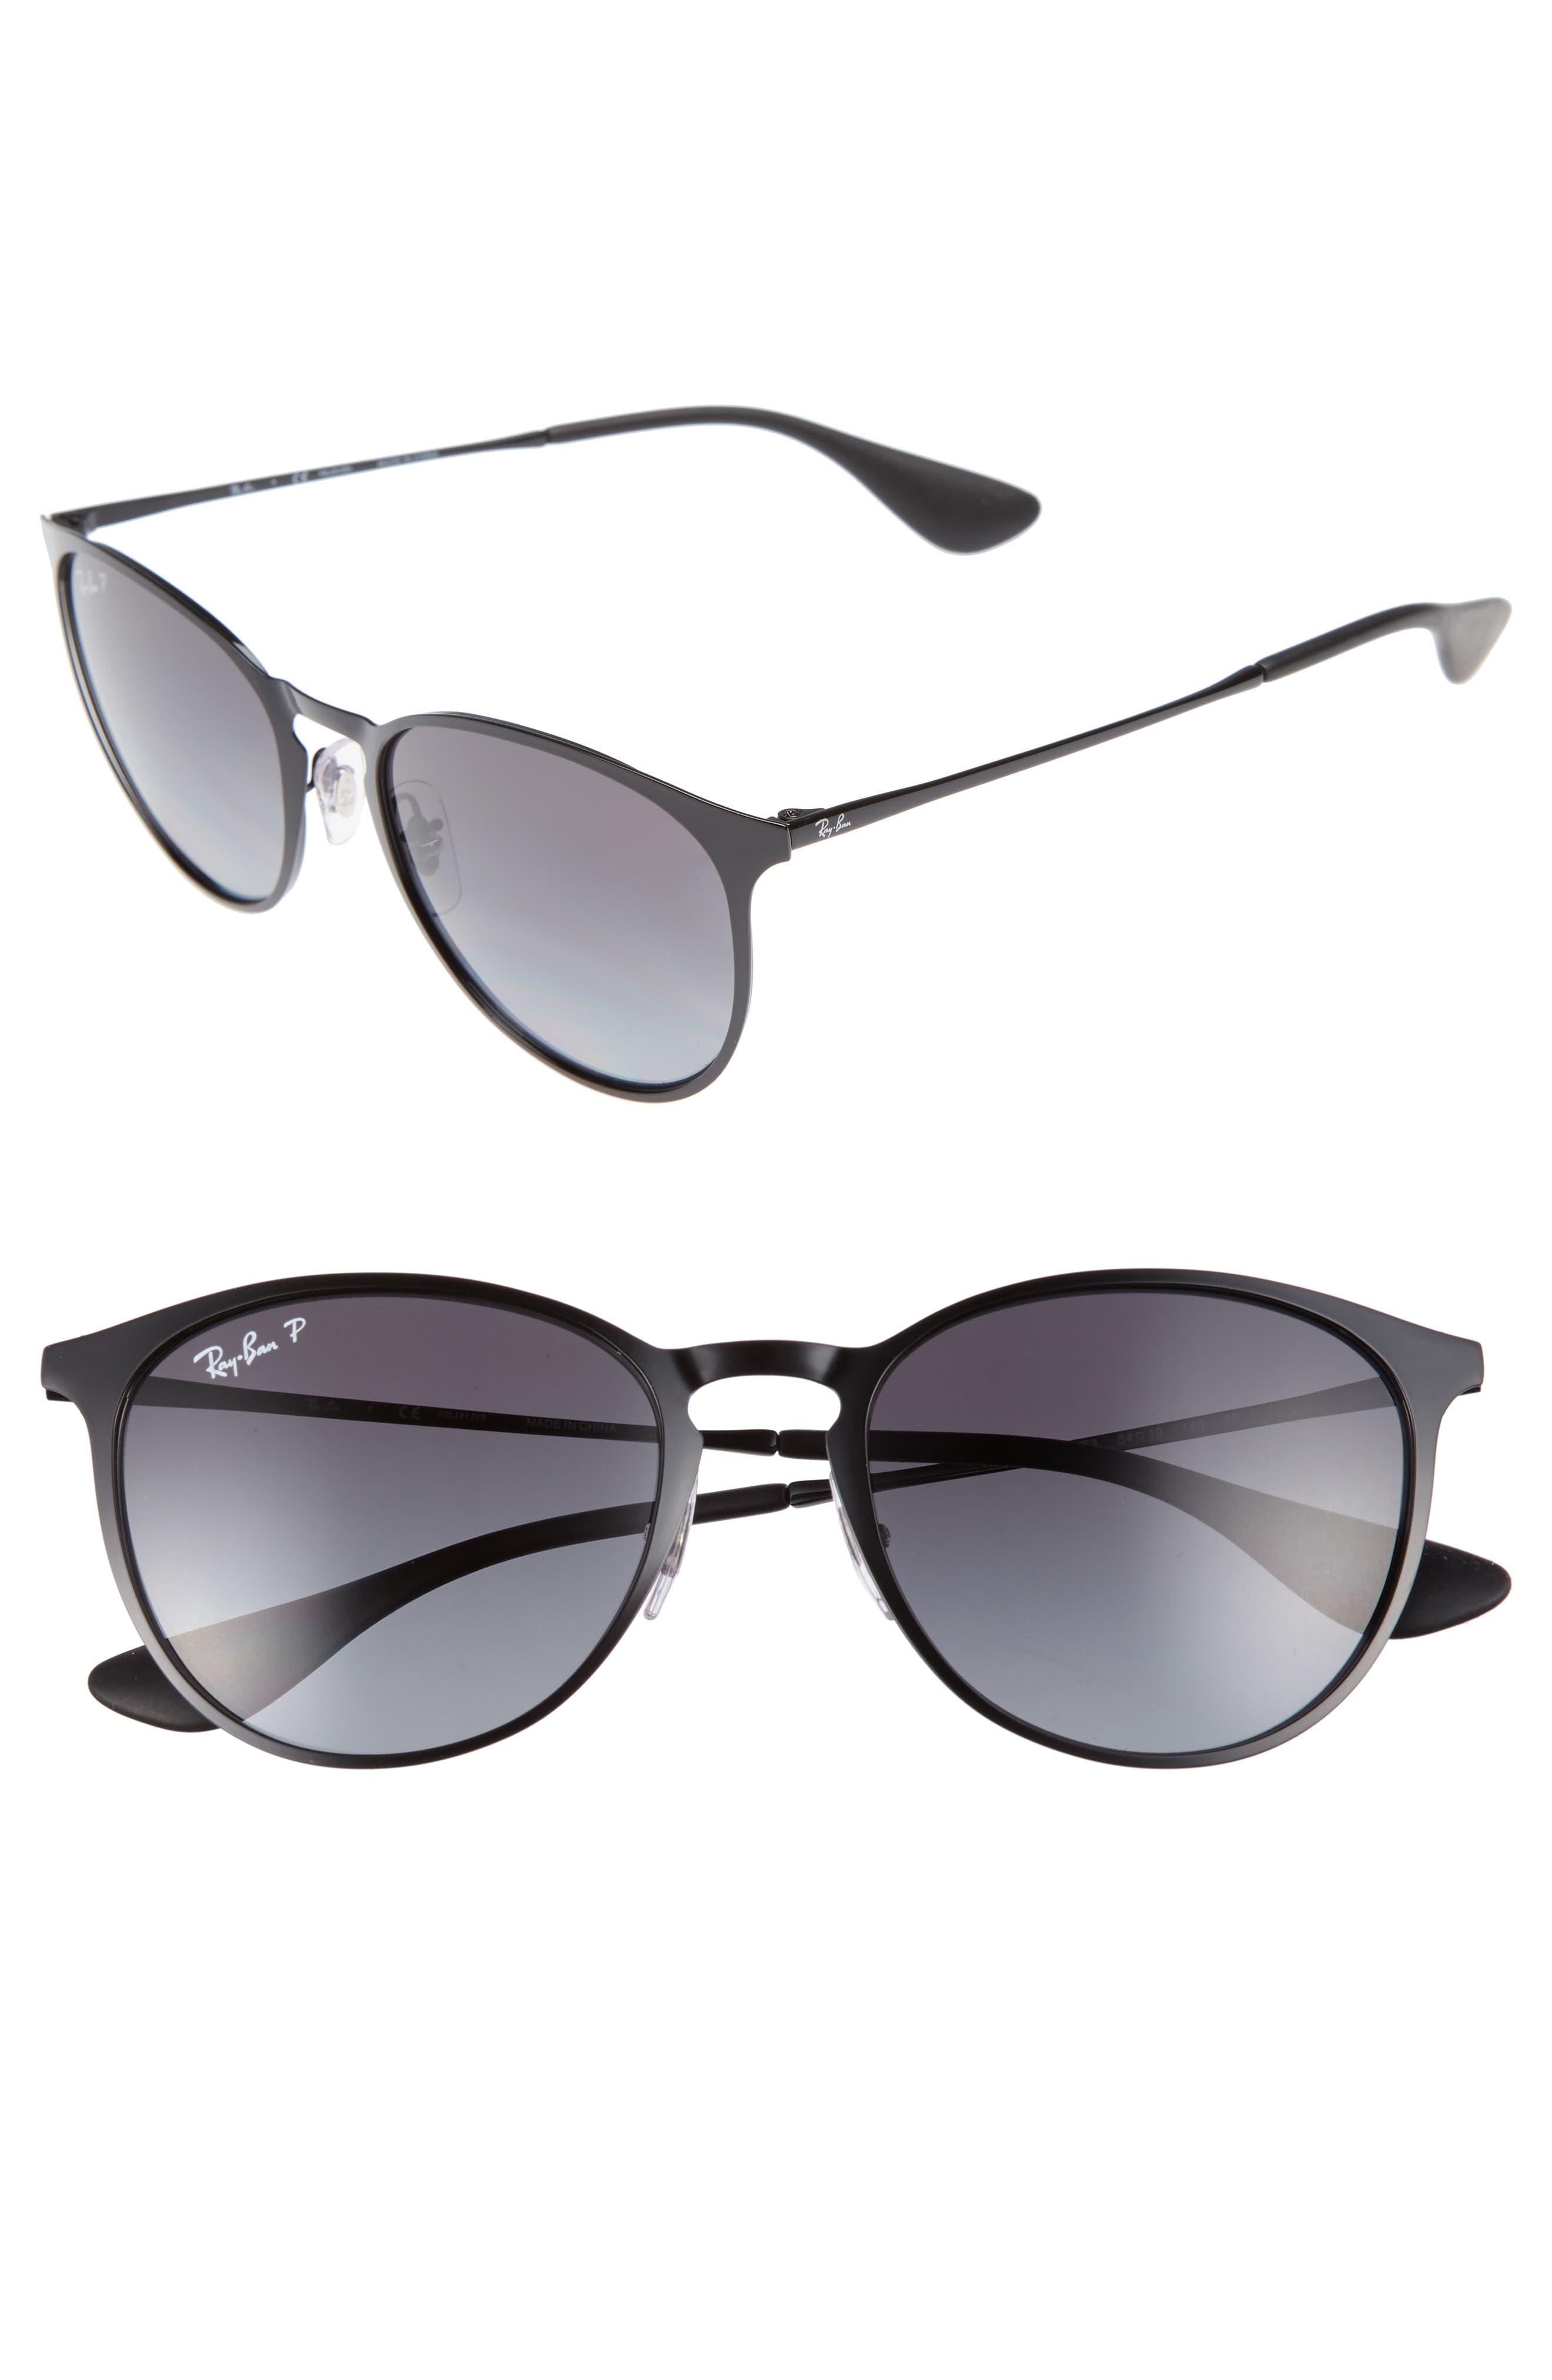 Ray-Ban Erik 5m Polarized Sunglasses - Shiny Black